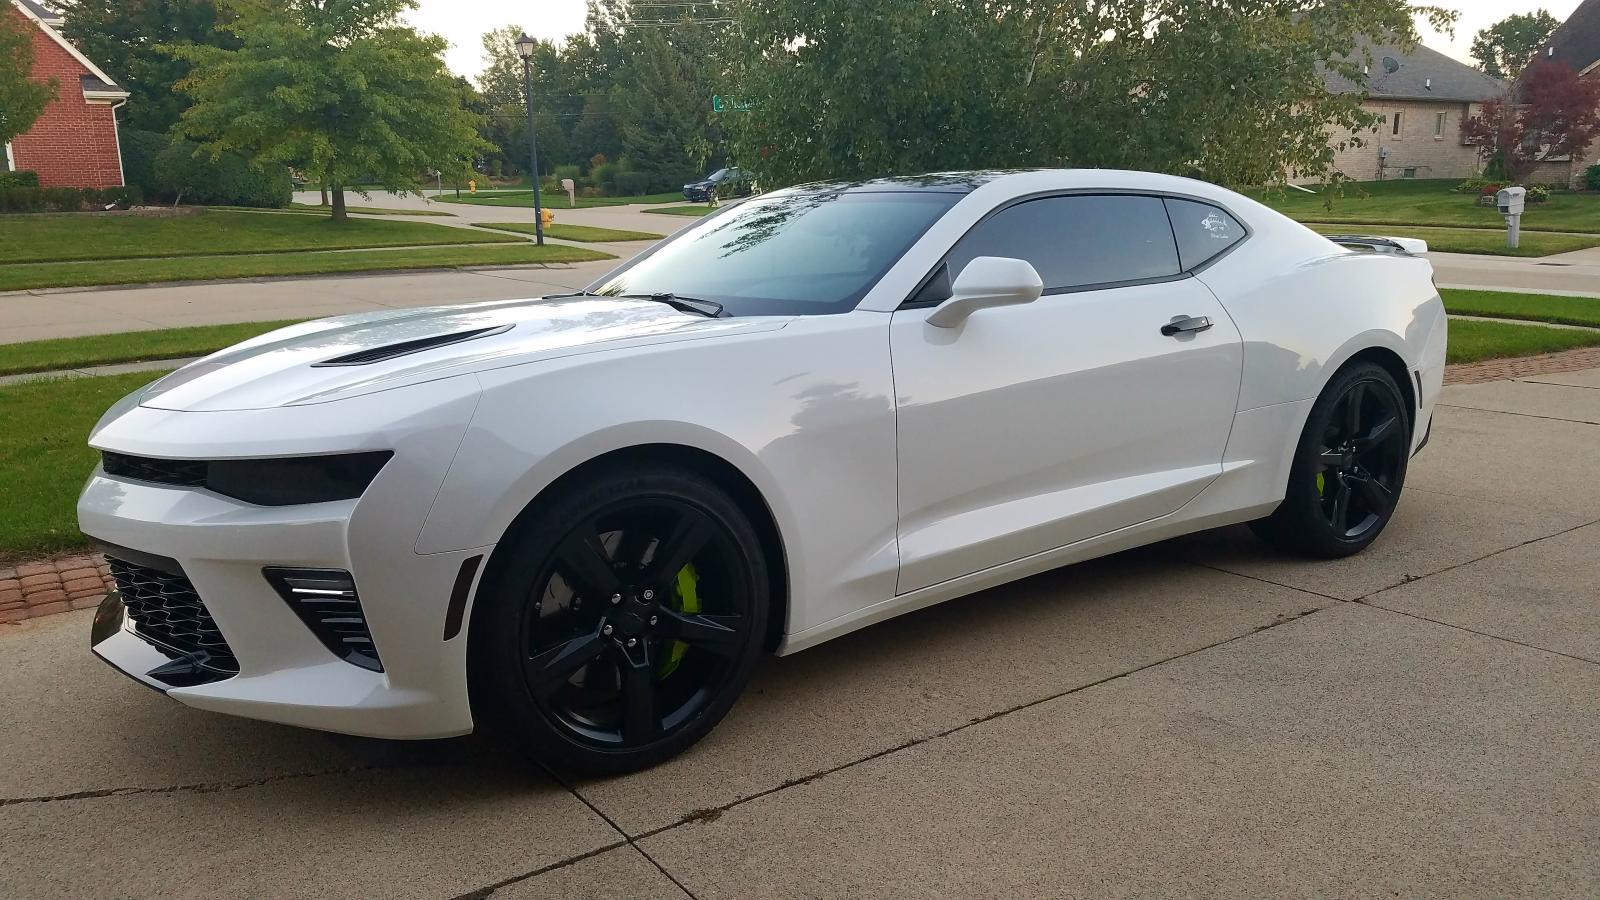 Michigan Car Ceremic Coating Price